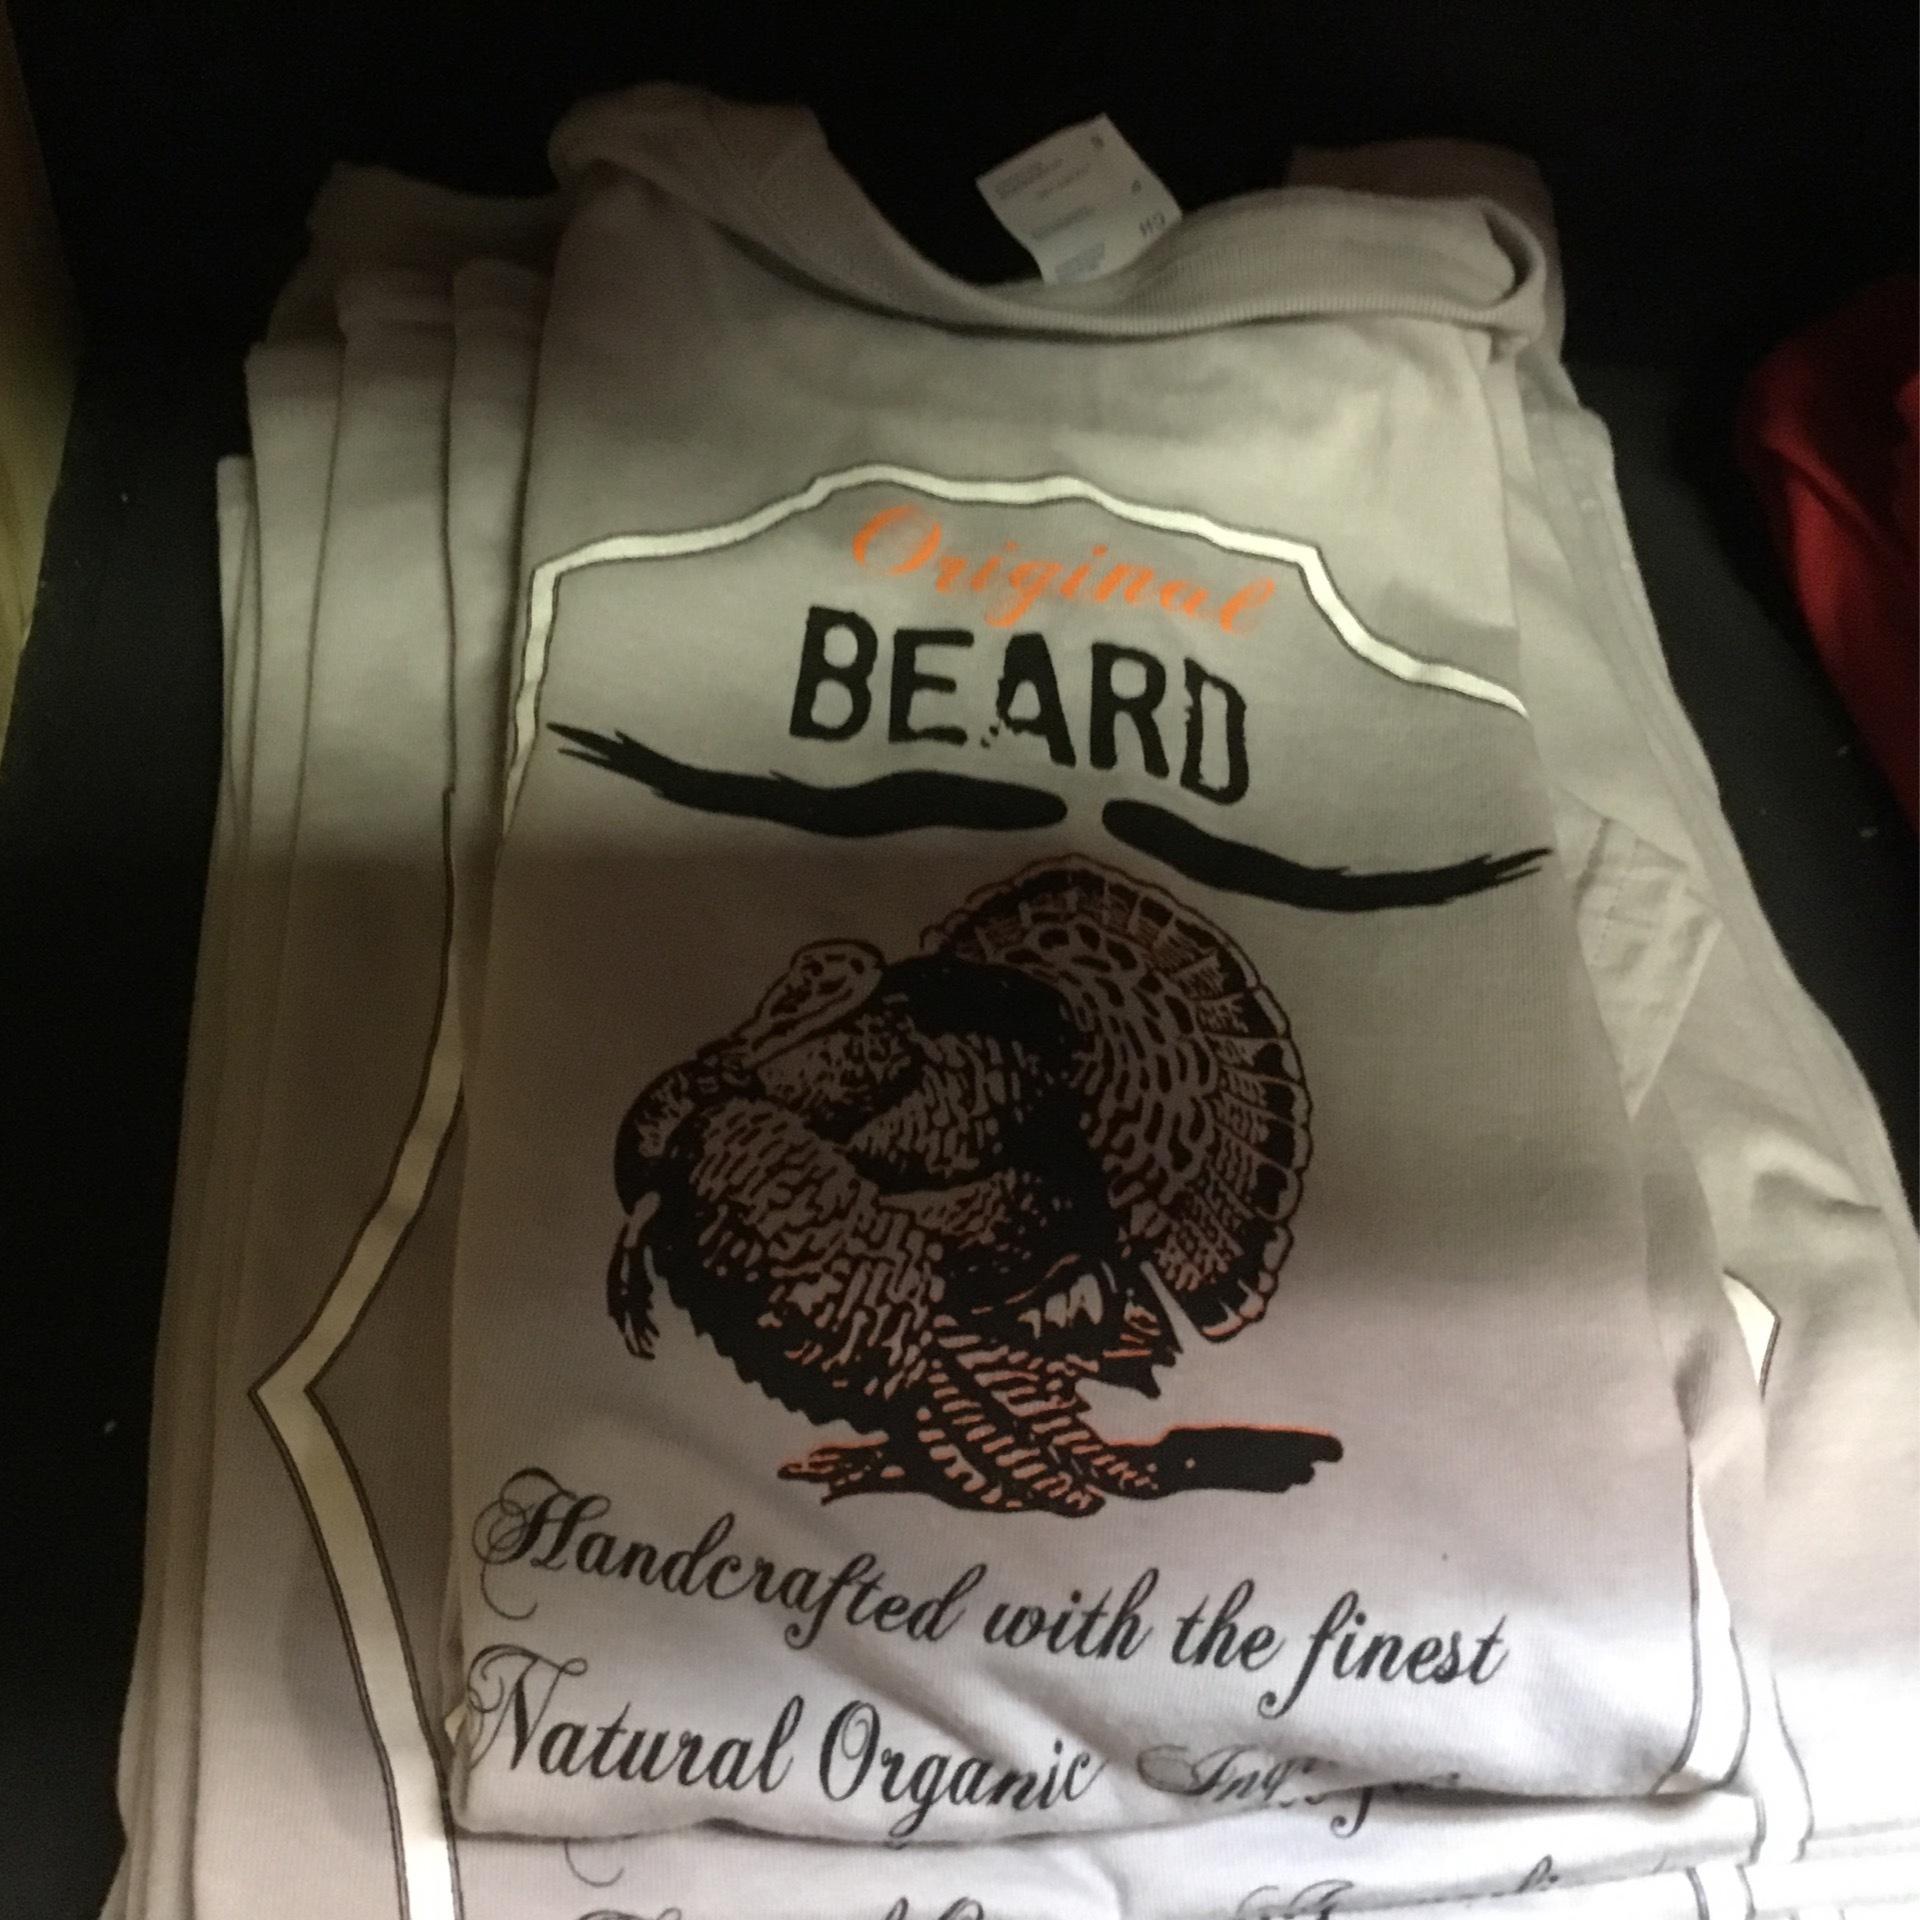 Original Beard YMULAVEMSE545XI462GGRQD6-base